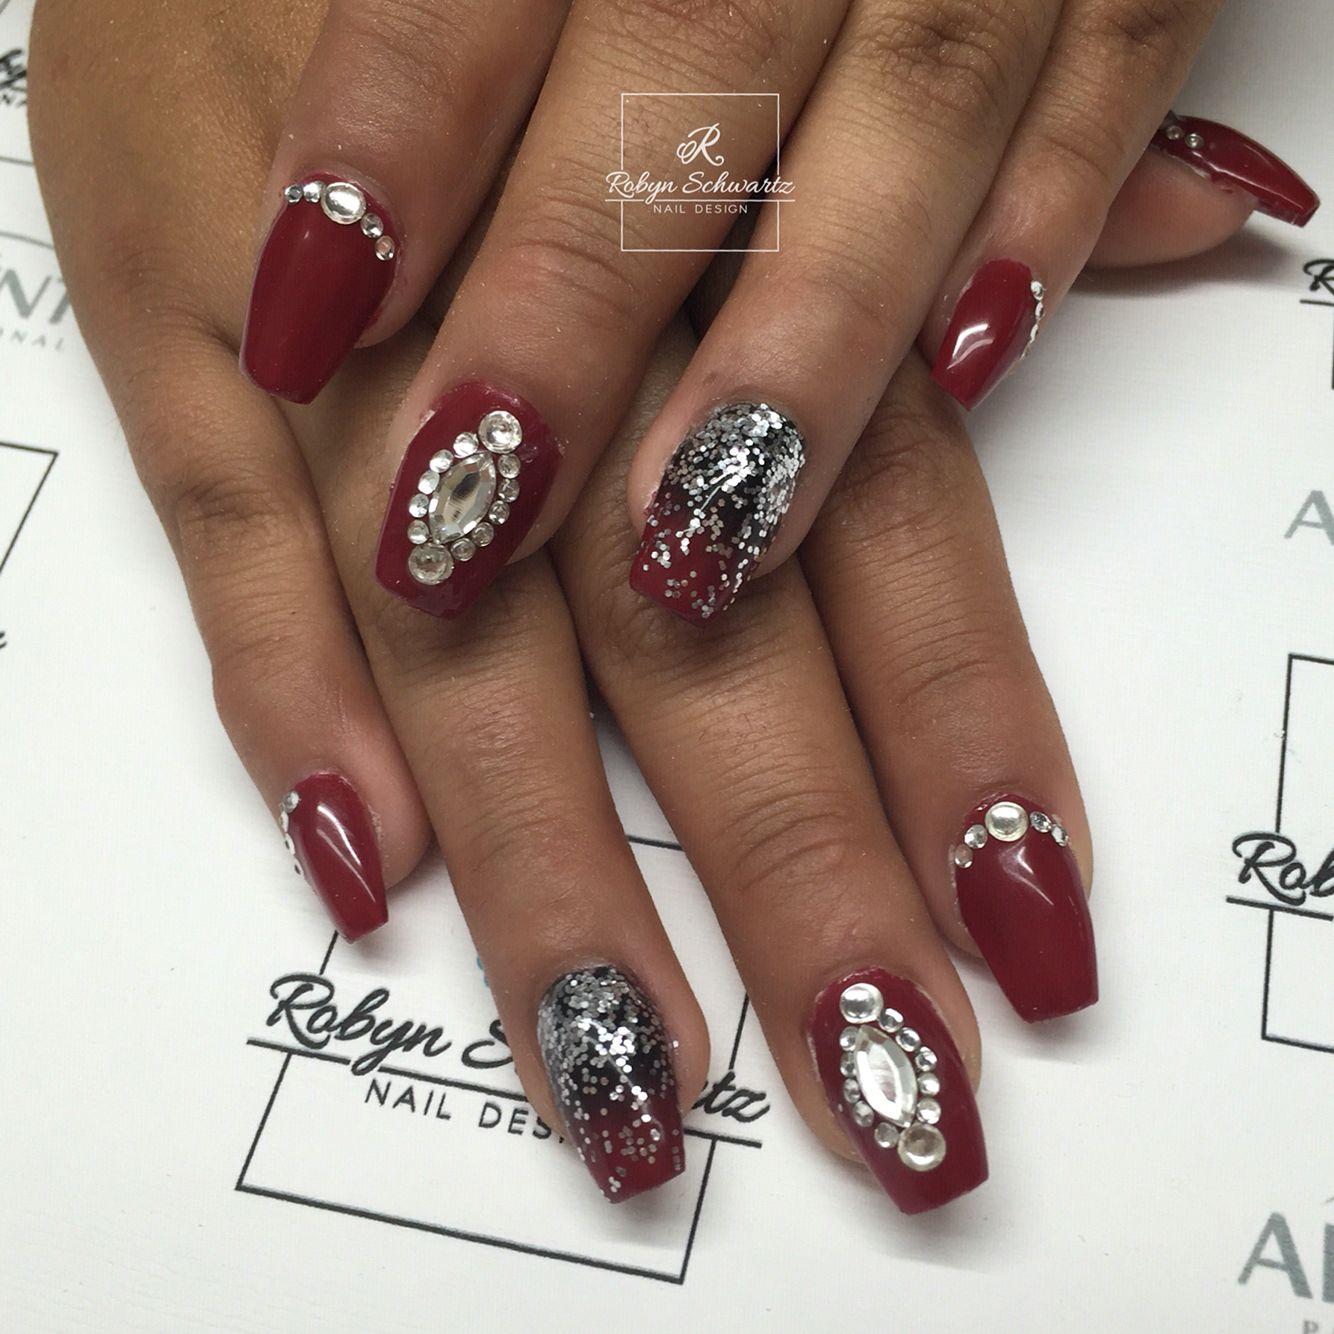 Swarovski Nail Art Stones: Swarovski crystal nail art craftideas.